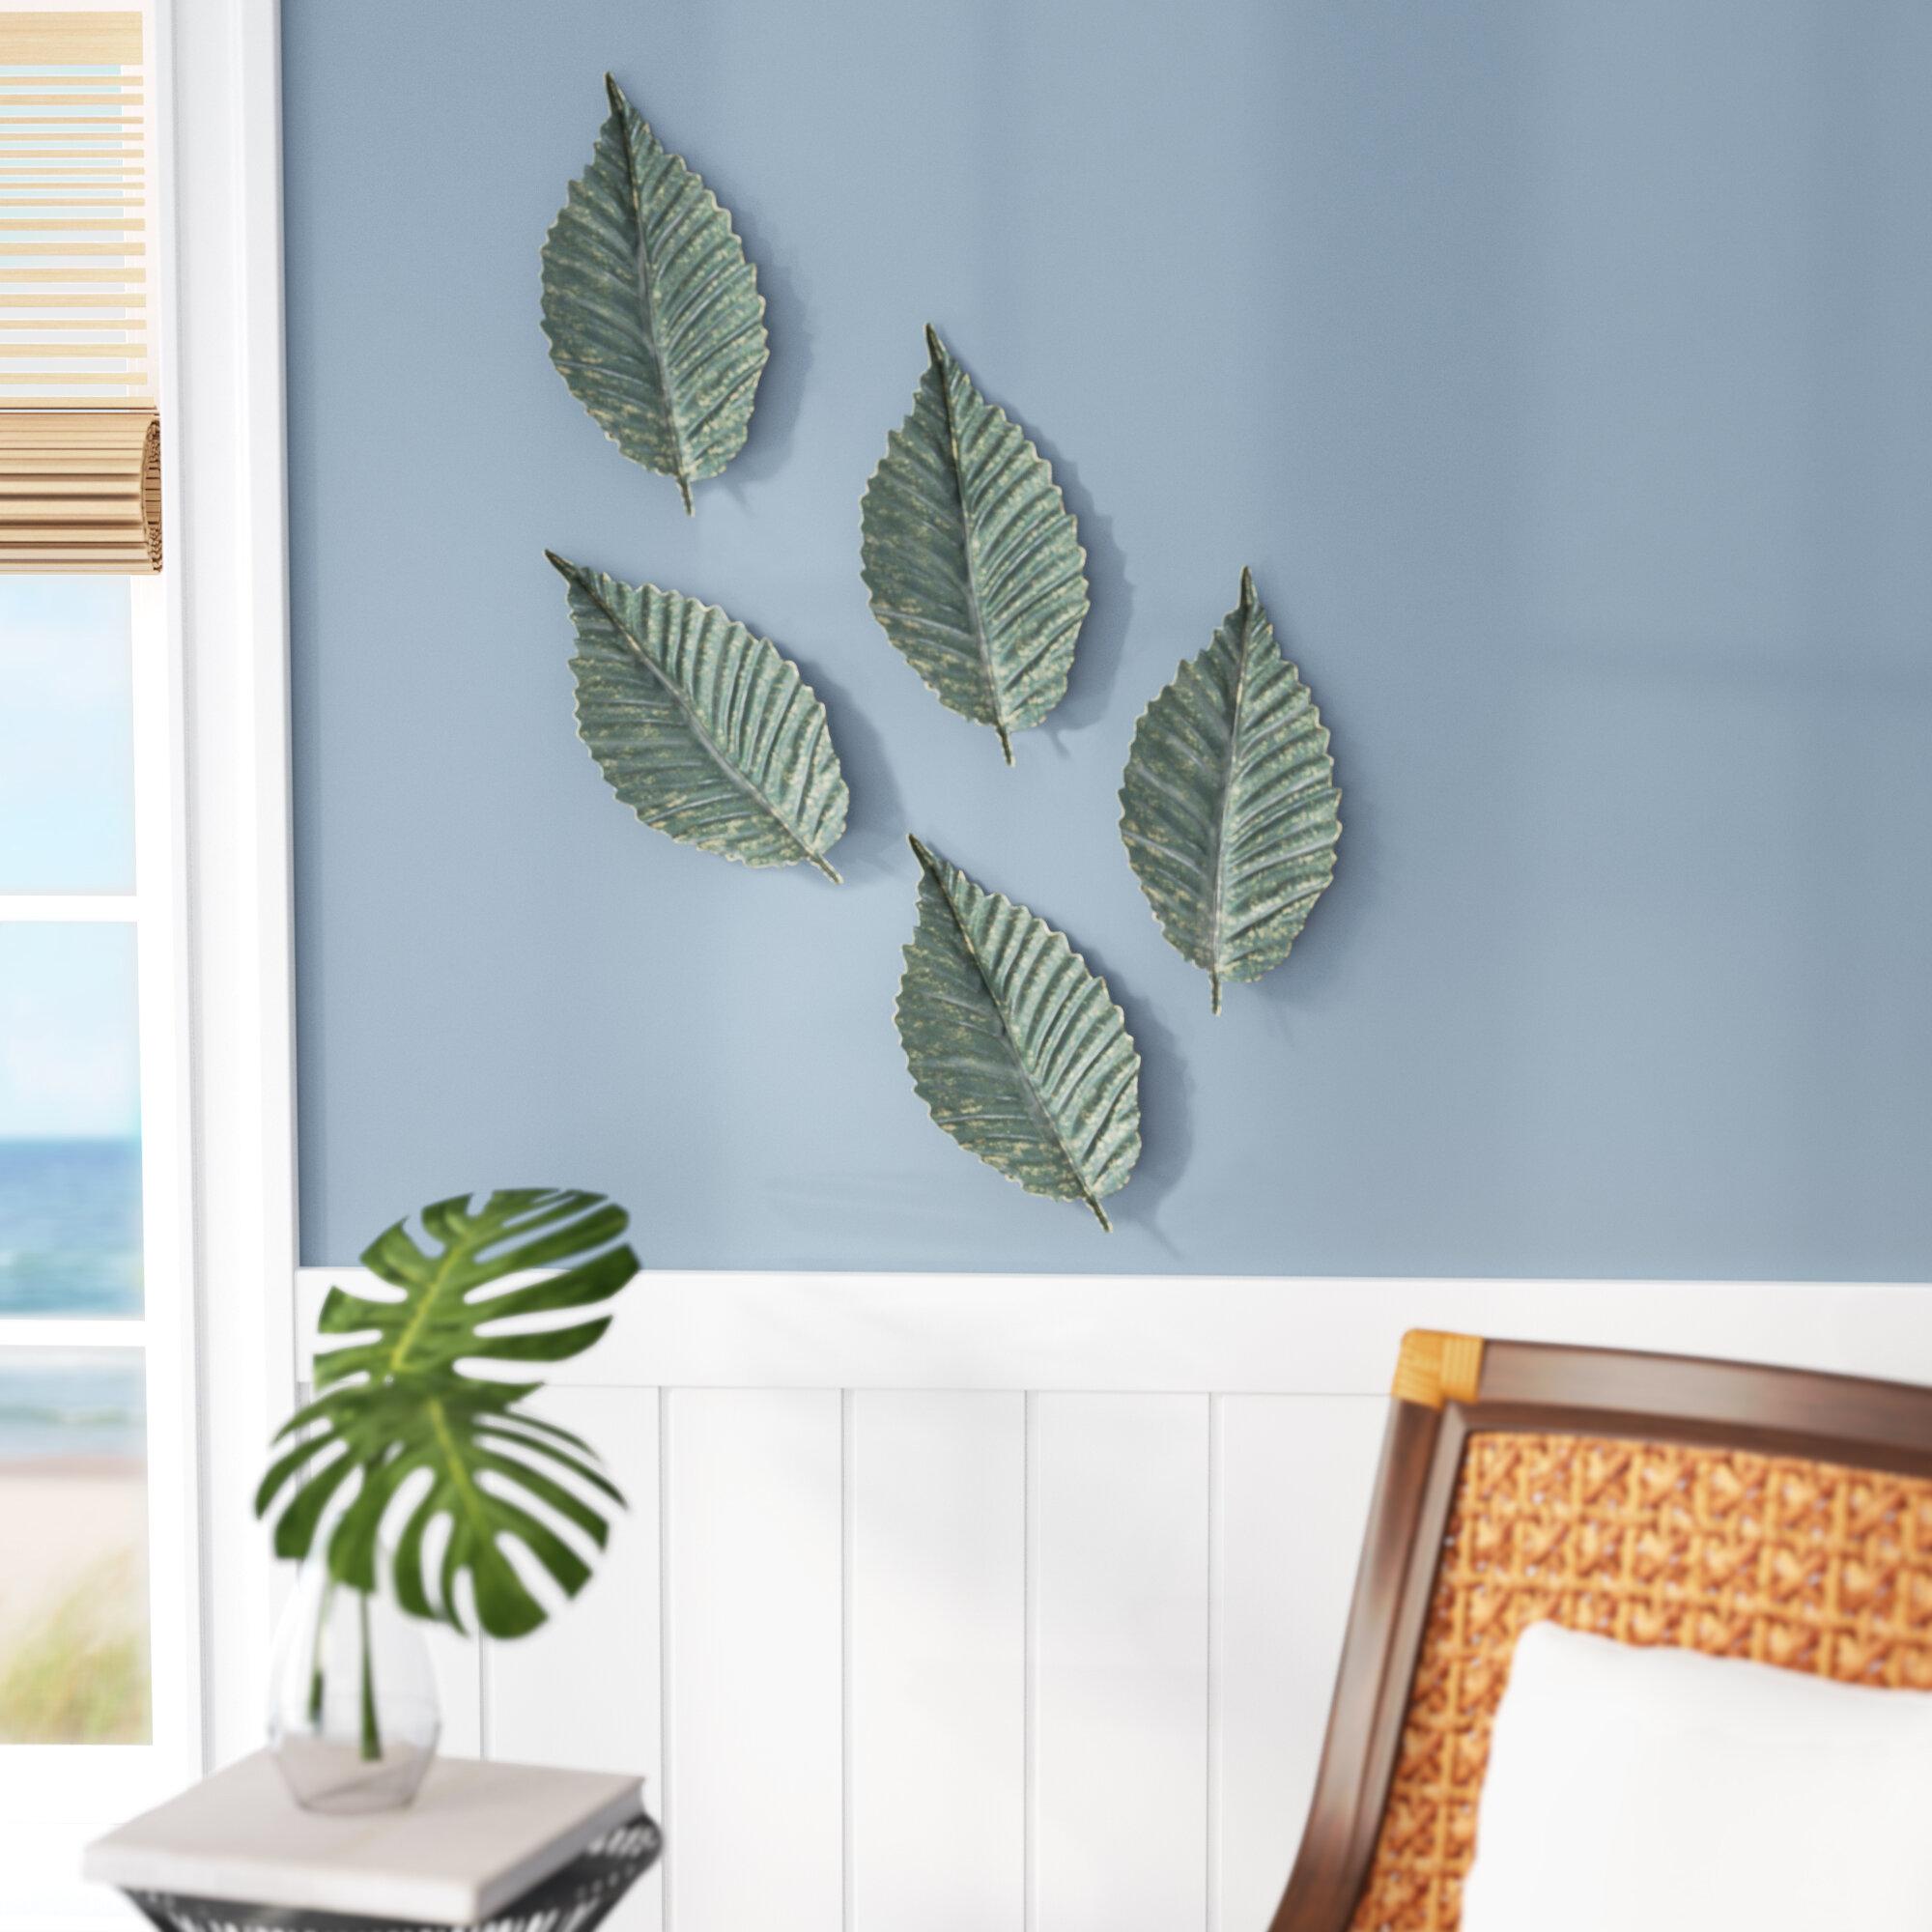 Decorative Brattea Leaf Wall Décor